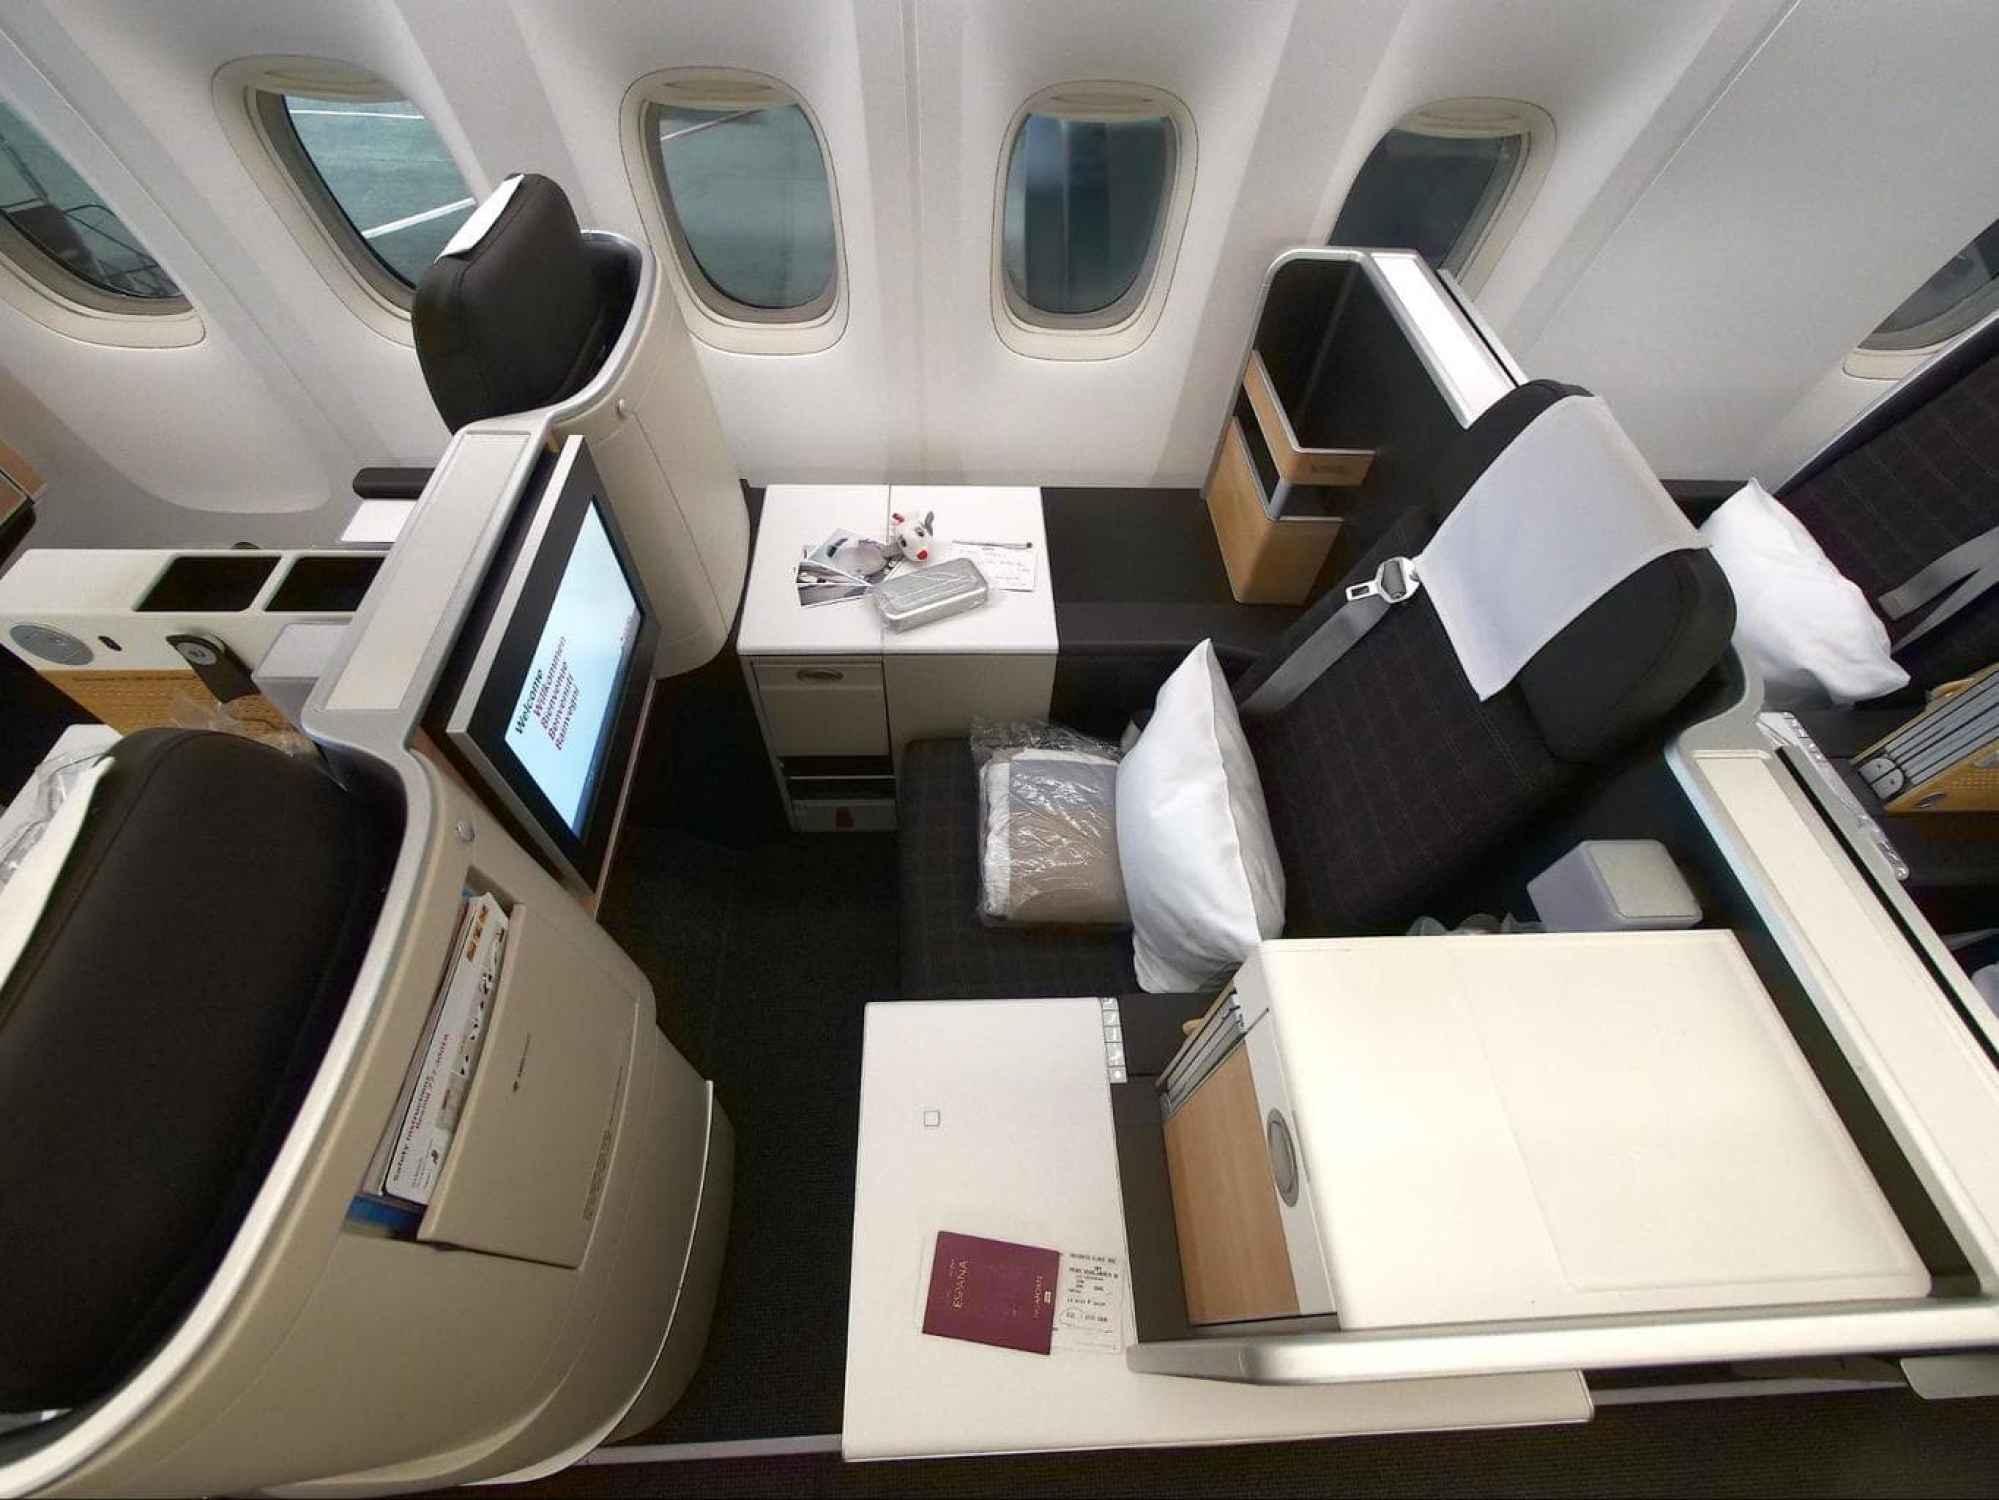 Swiss Business Class throne seats